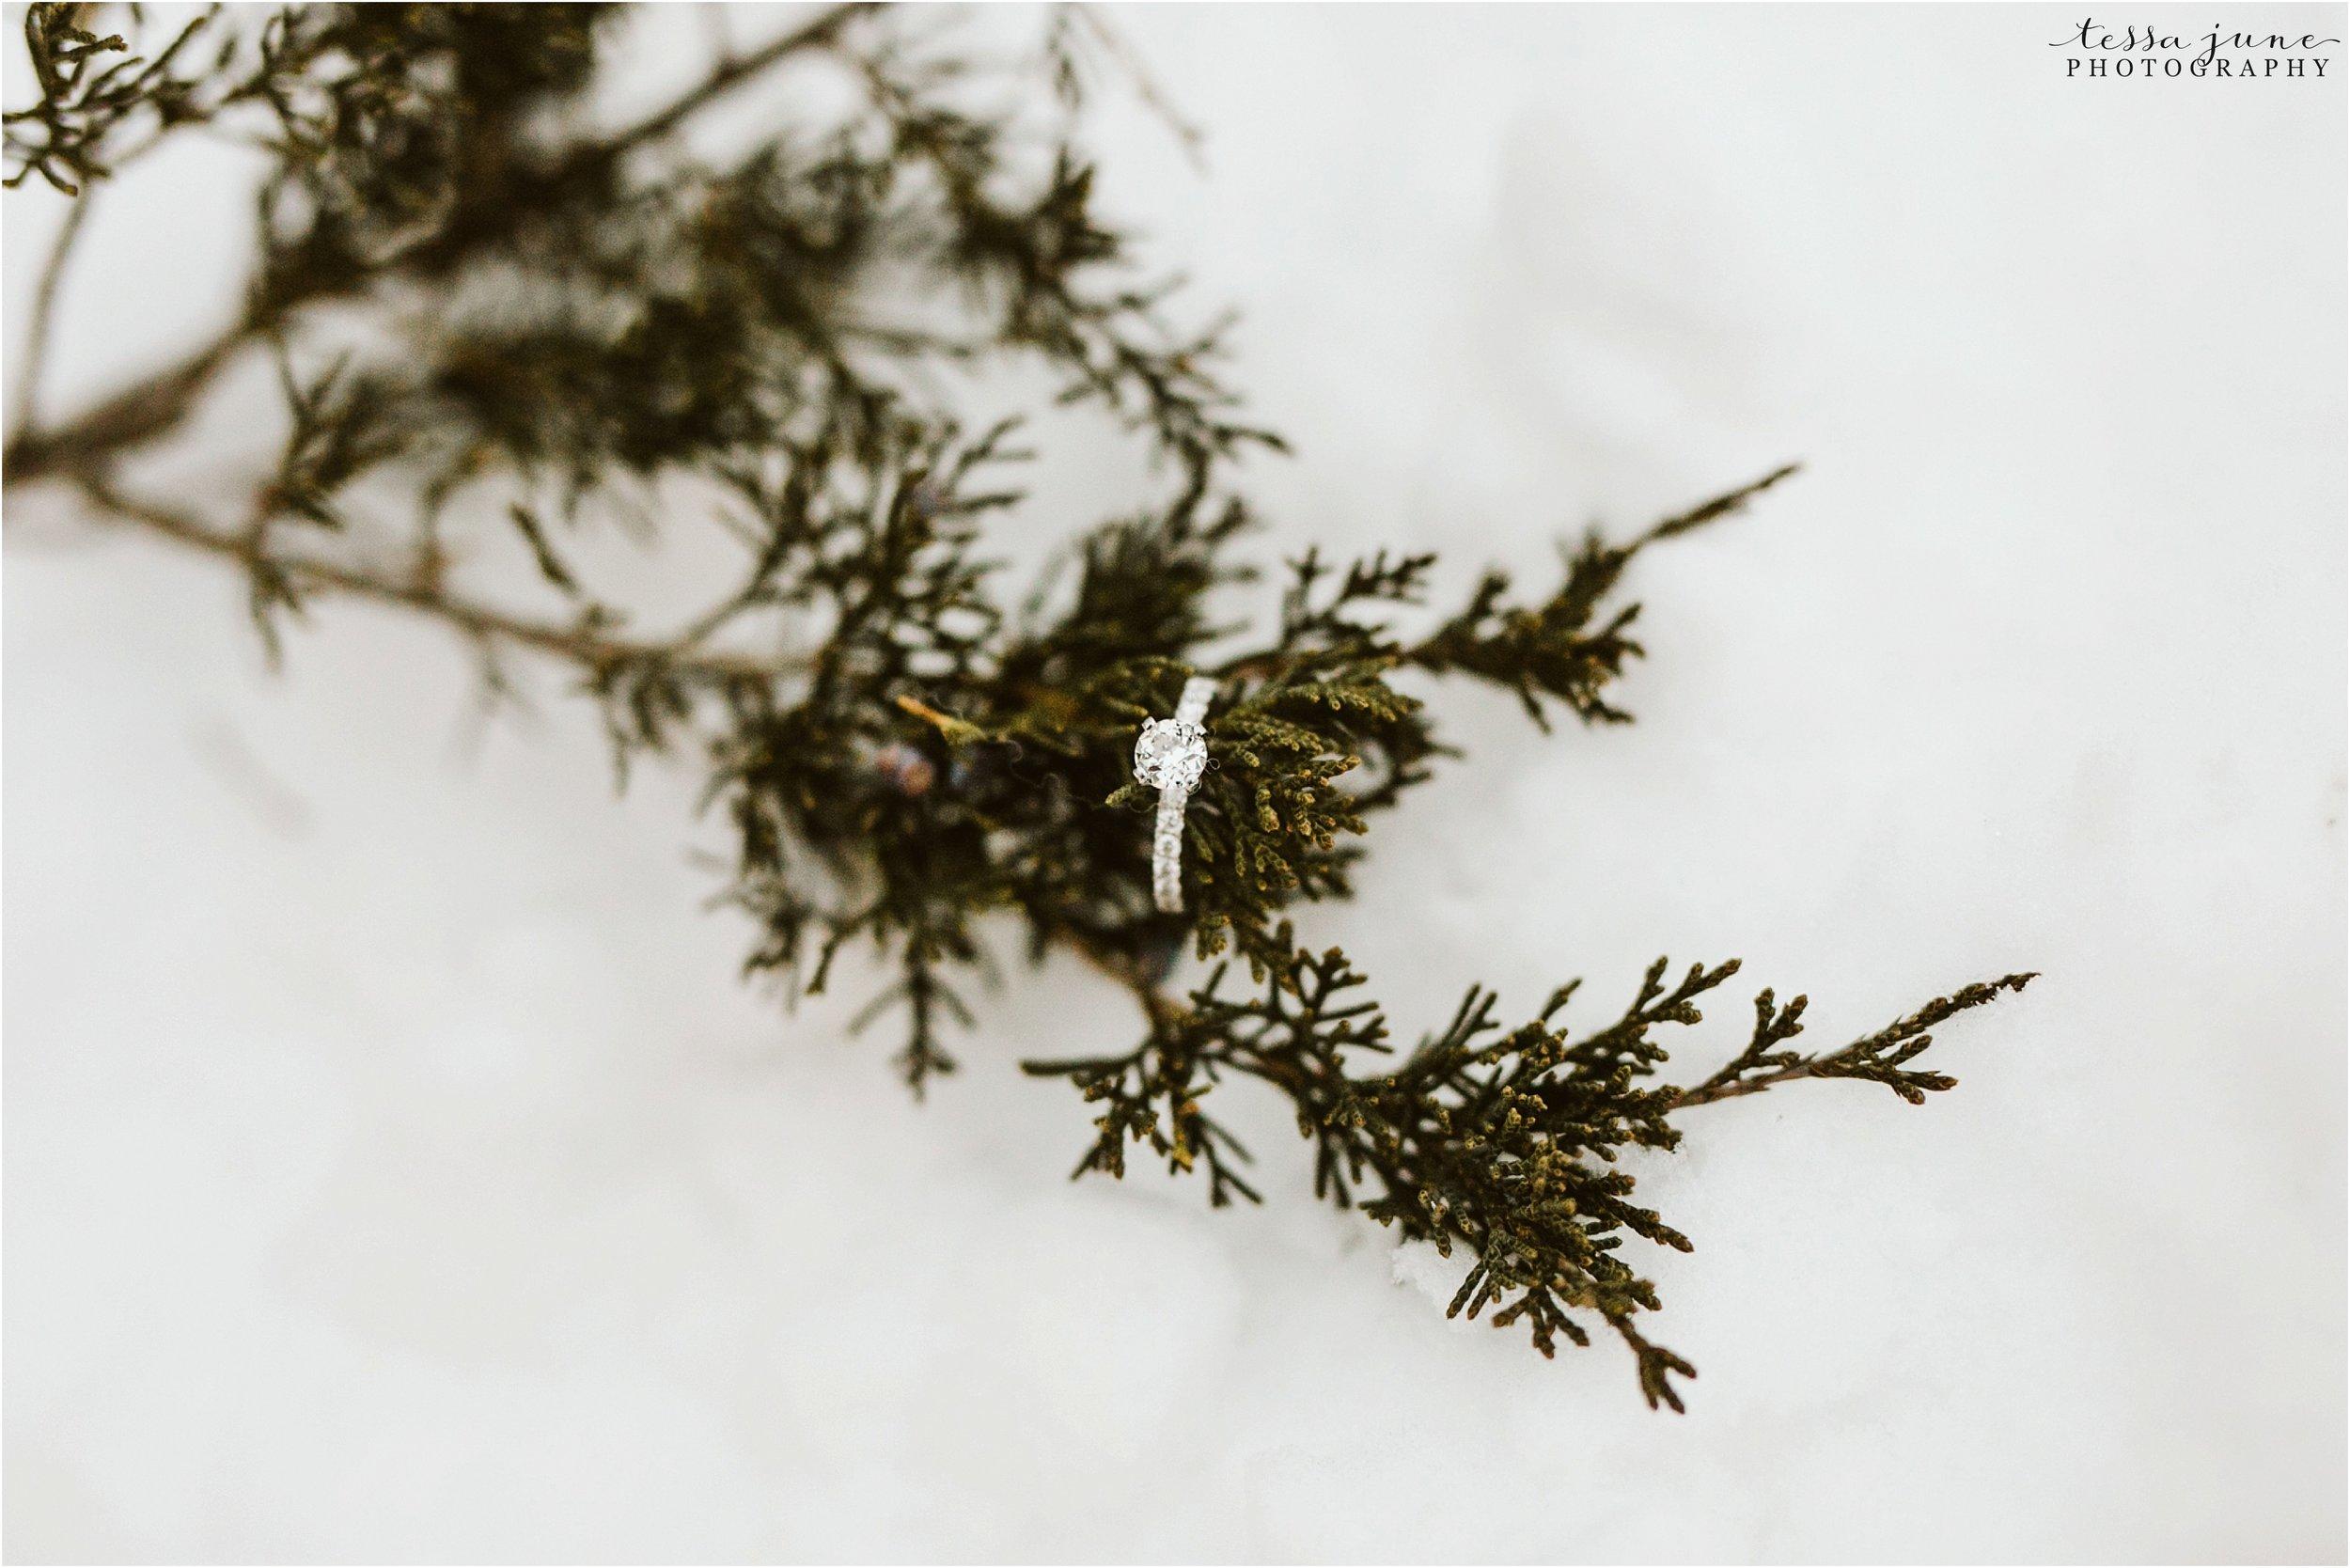 taylors-falls-winter-engagement-session-st-cloud-photographer-33.jpg